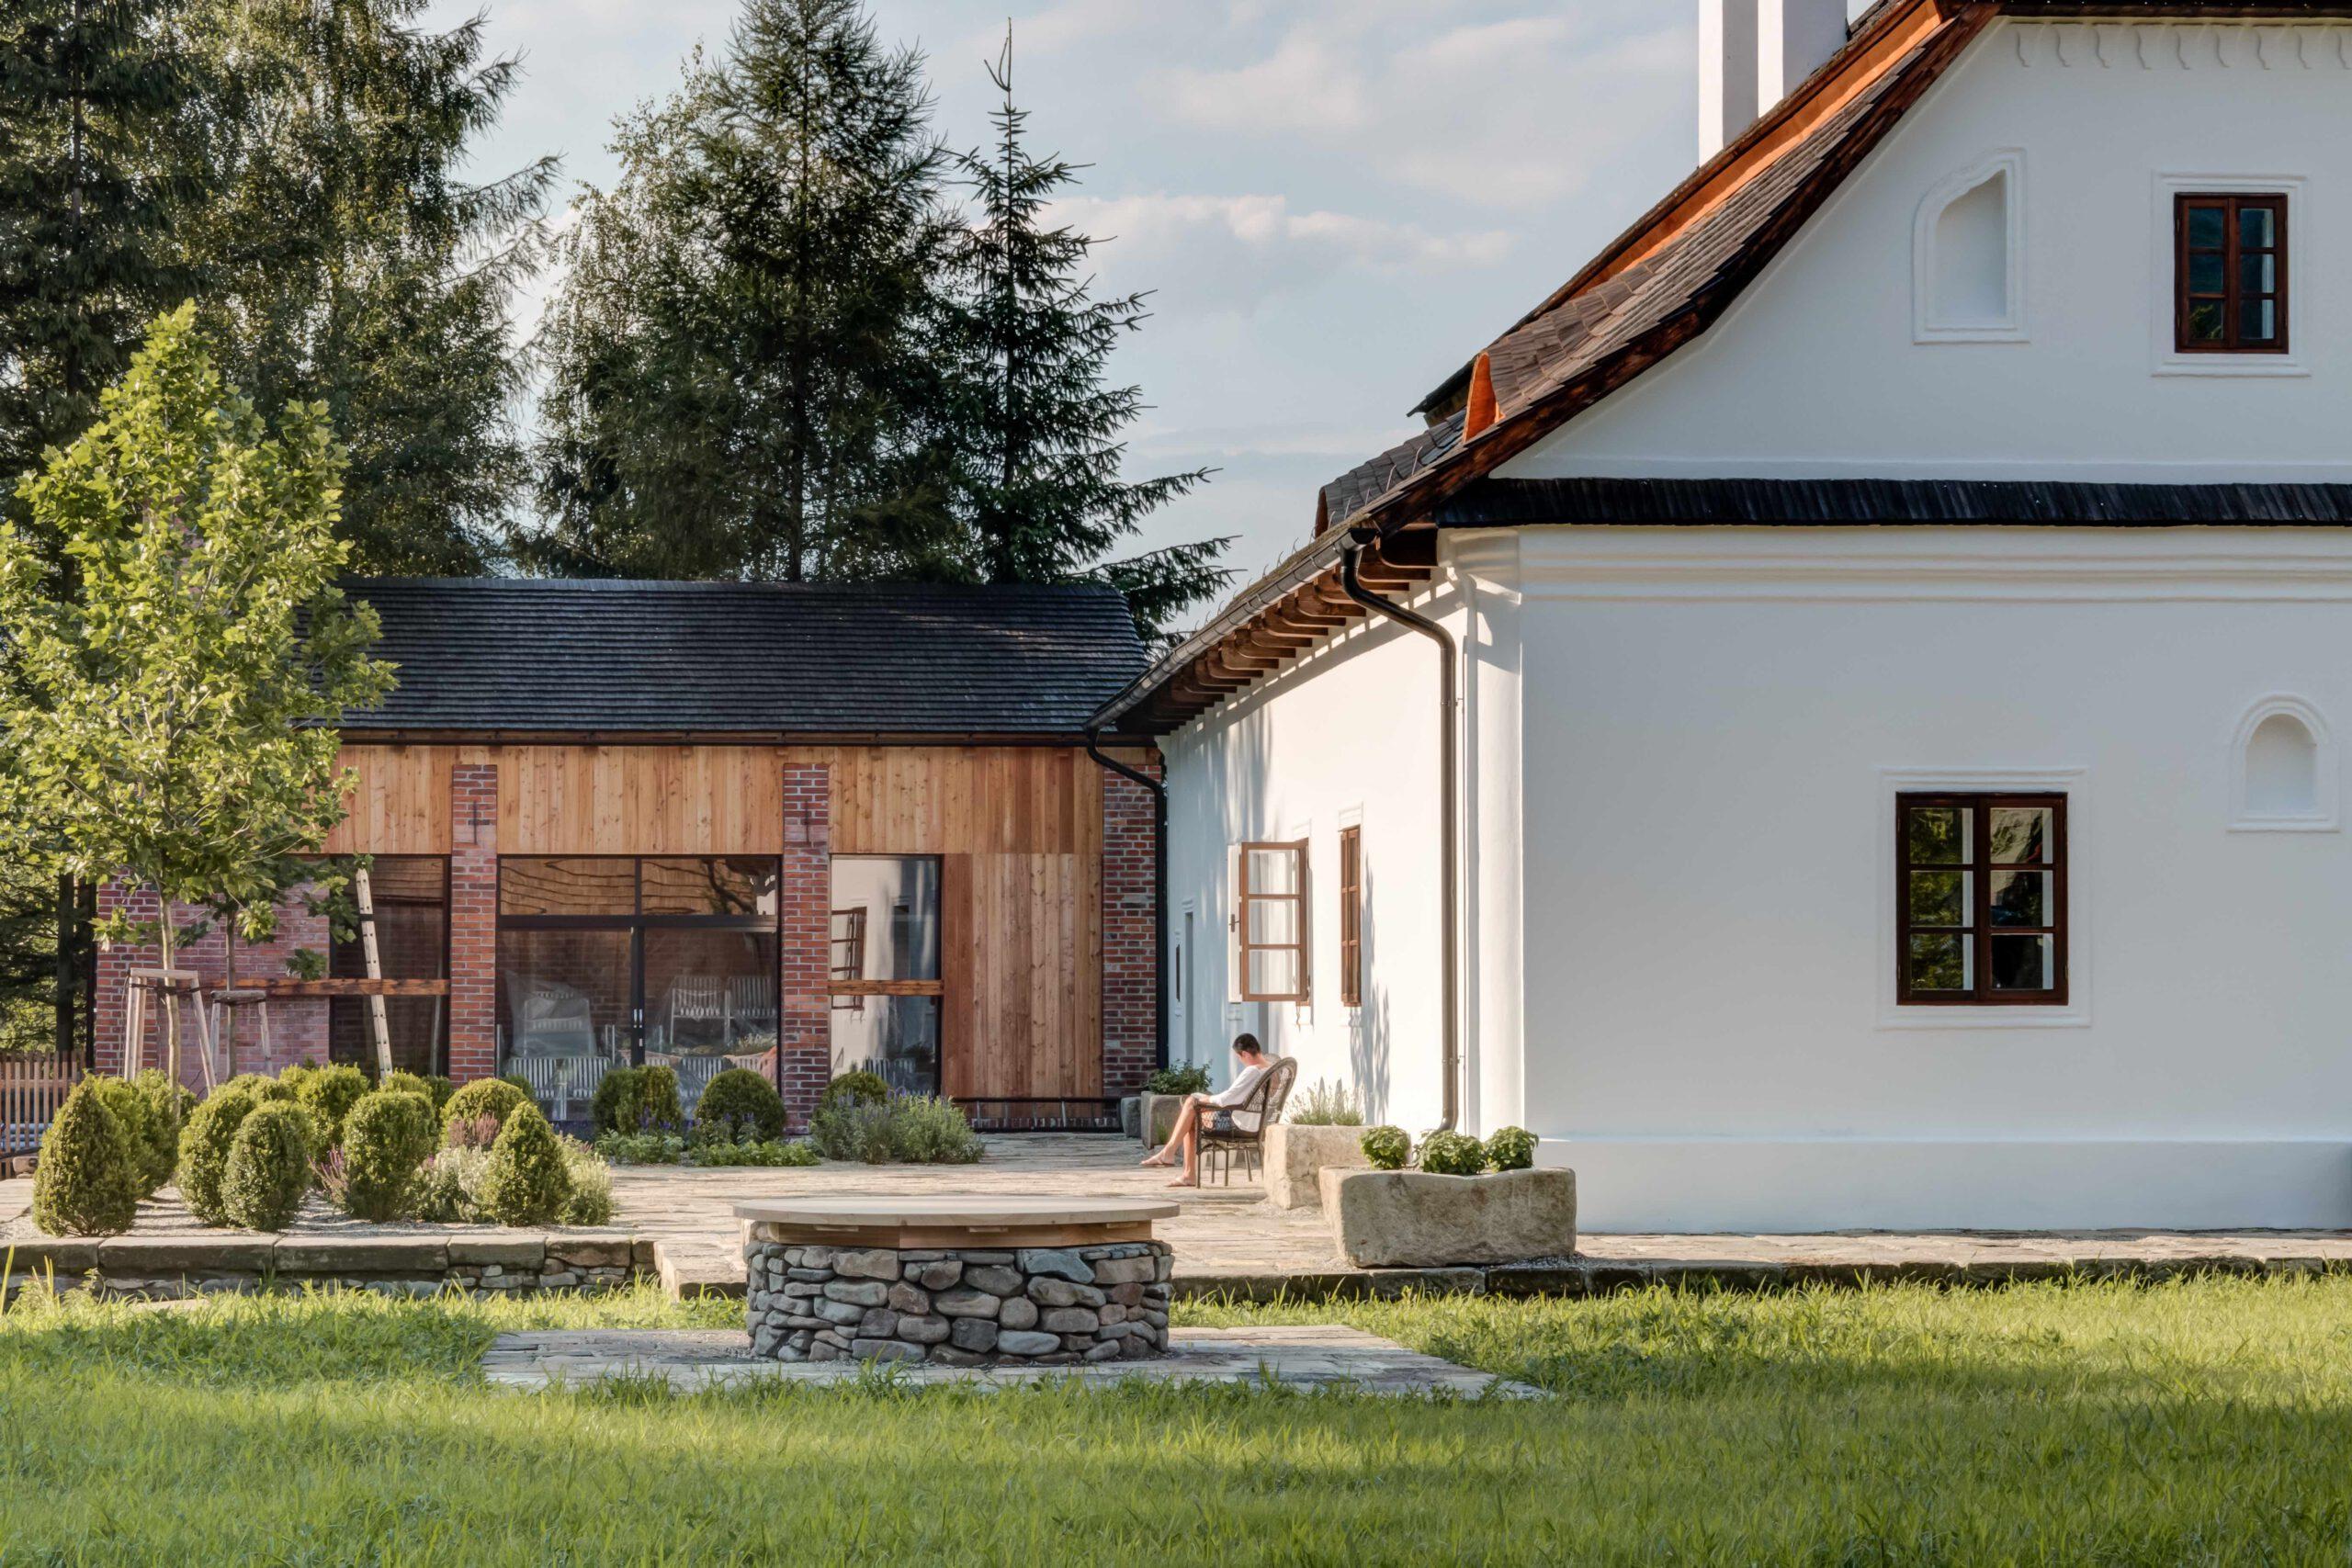 Mezi Plutky ferienhaus Romana Bennet holiday home